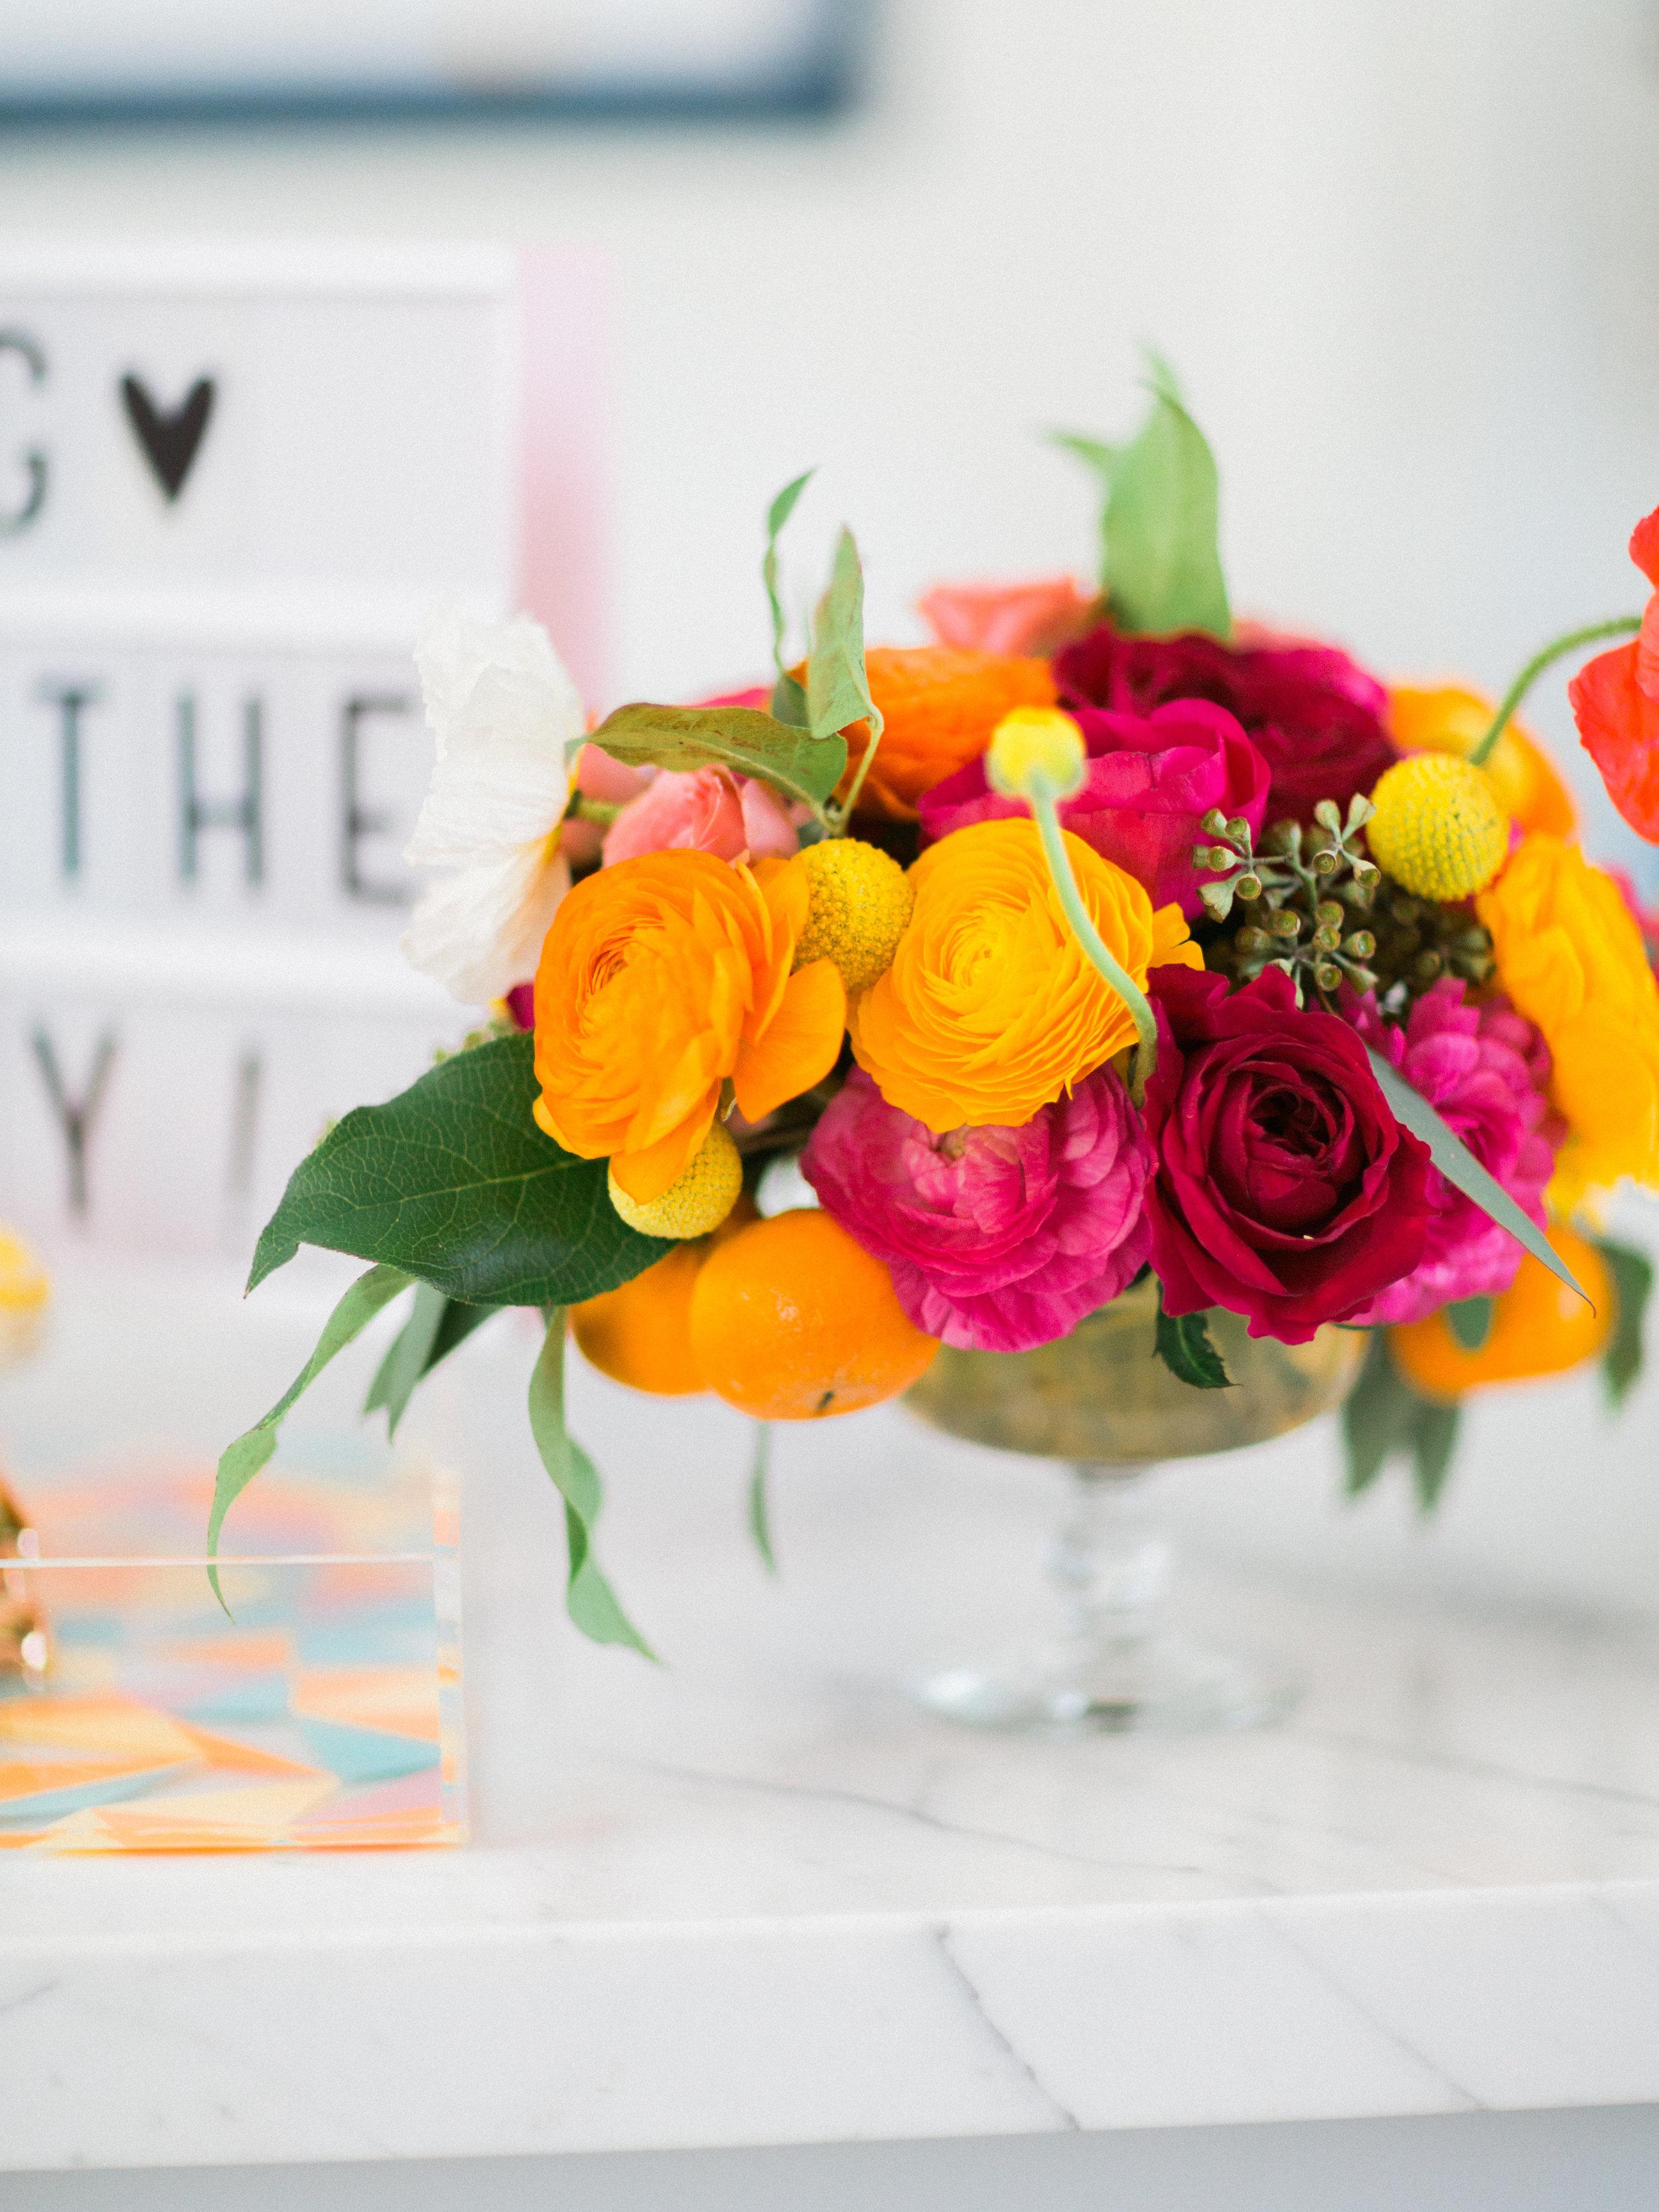 Bright_Cirtus_Florals_Sibyl_Sophia_Florist_Centerpeice.jpg